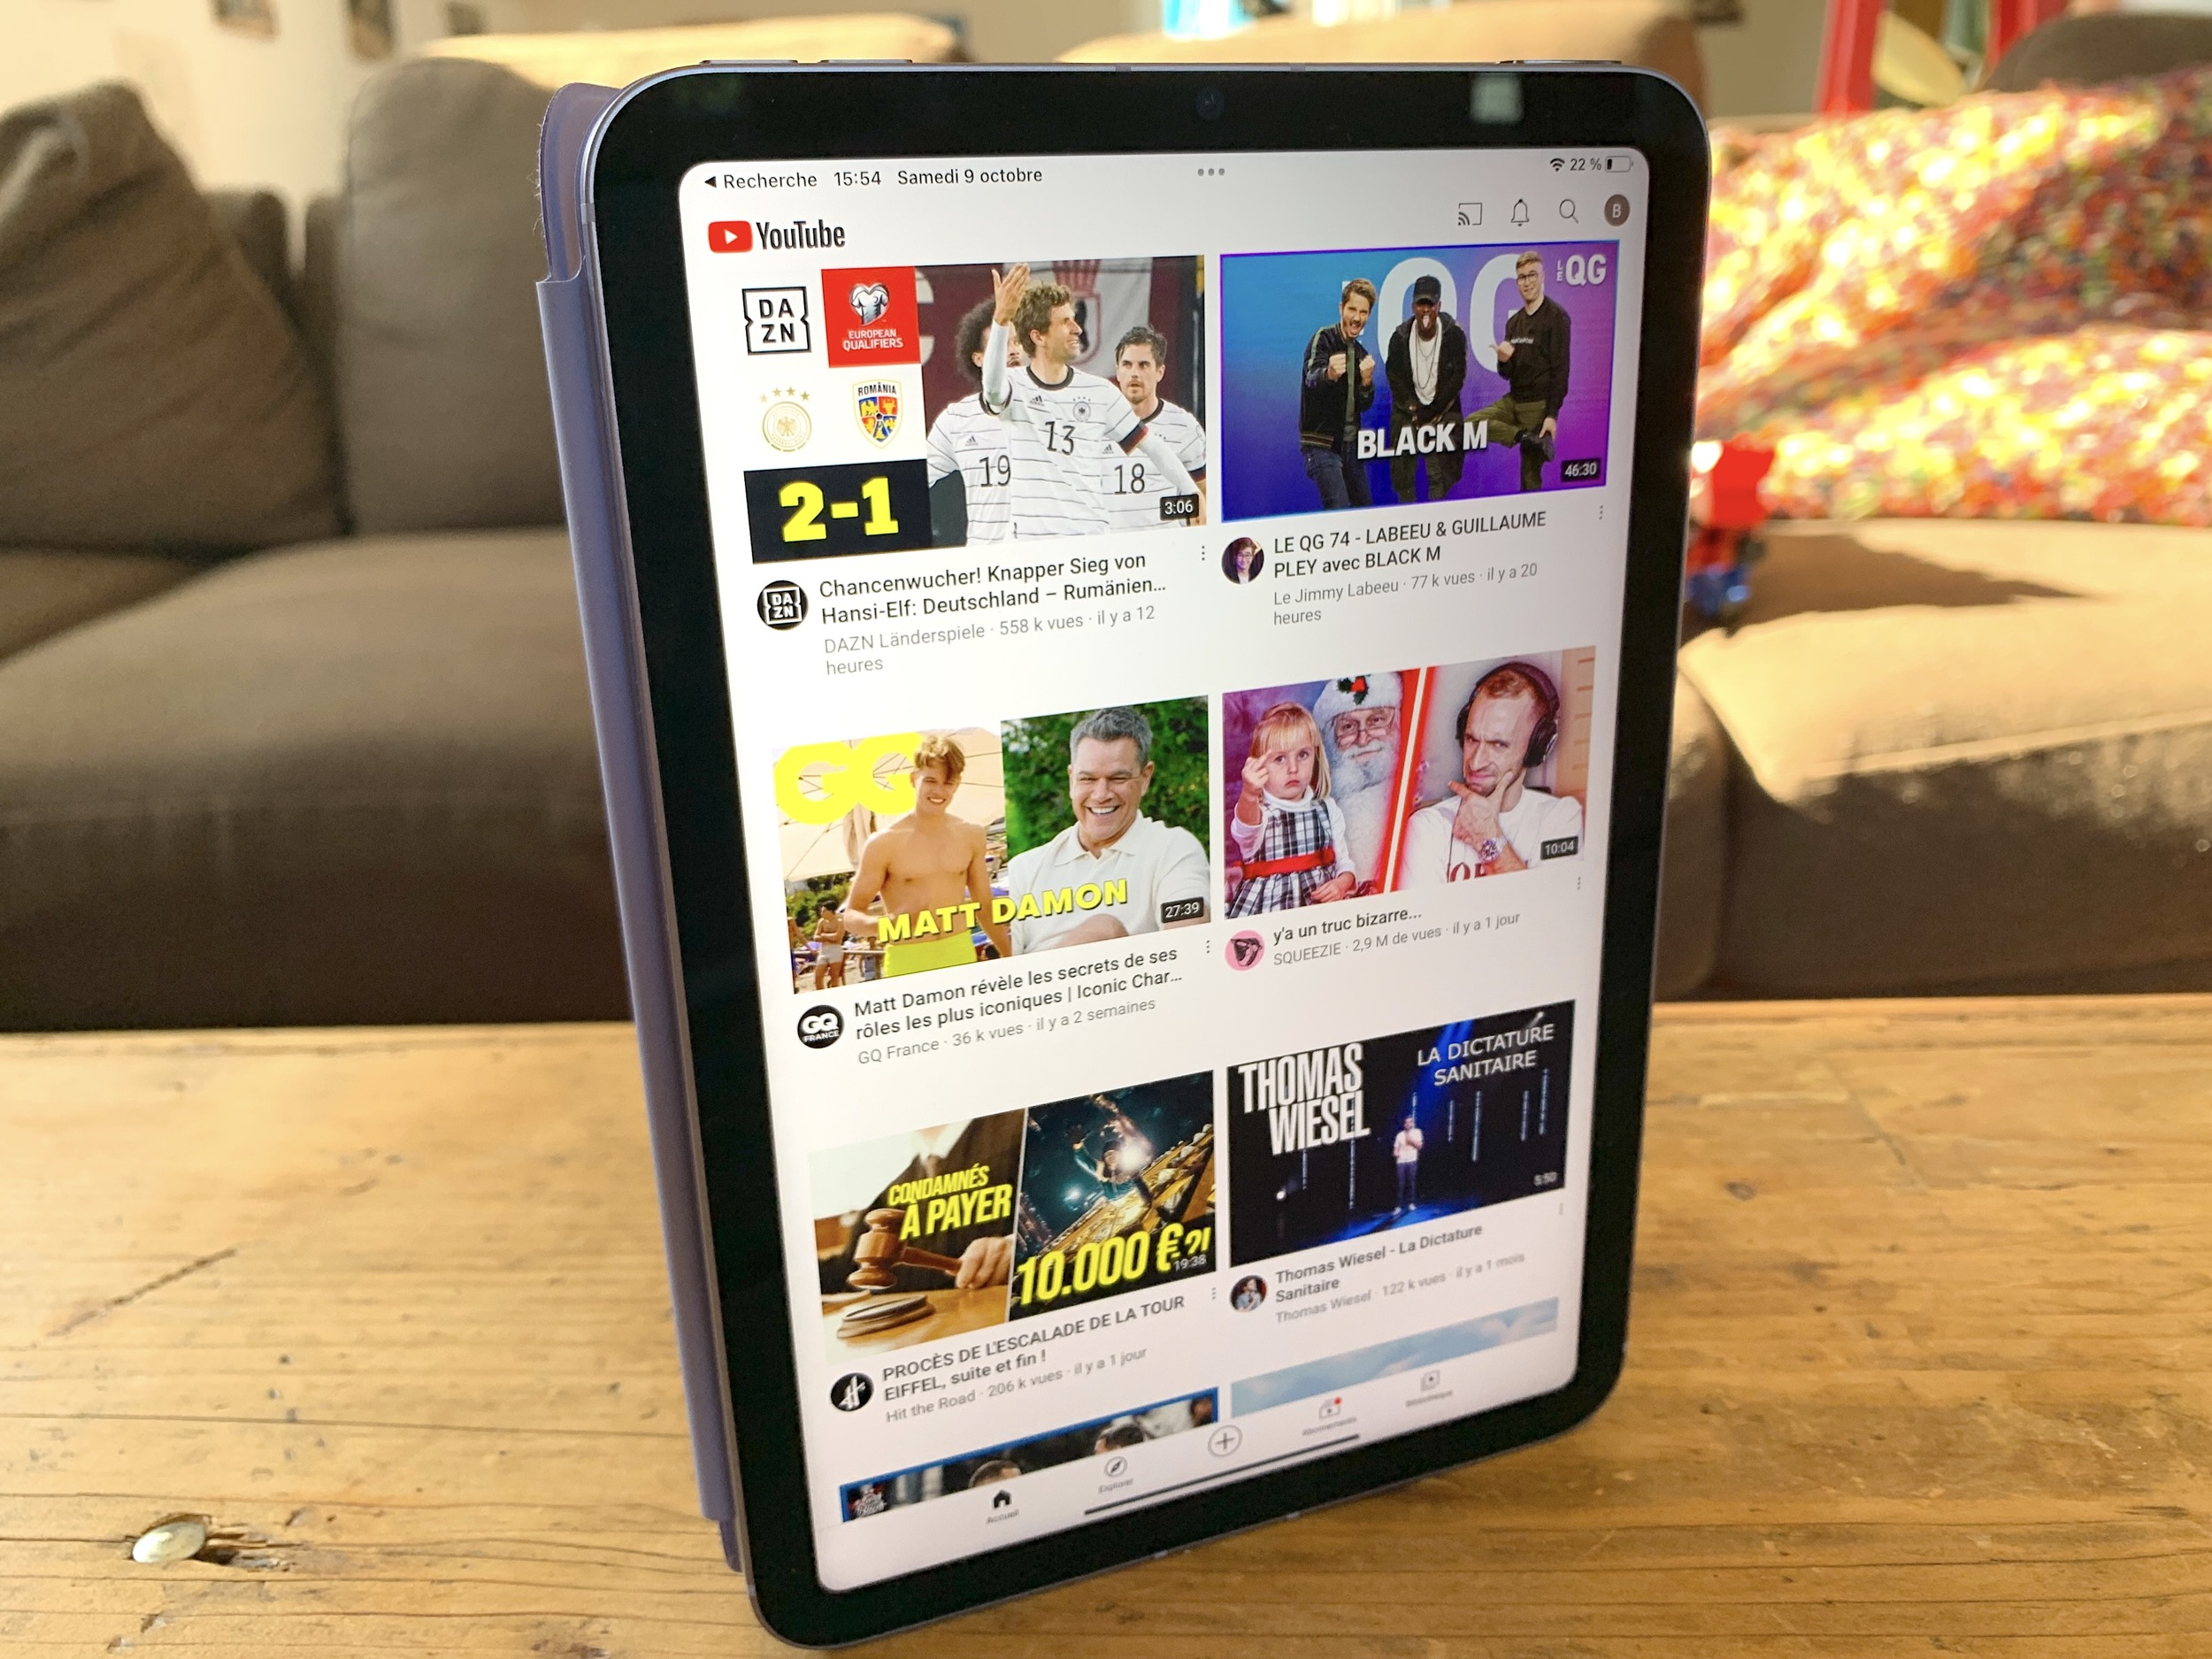 iPad mini 6 YouTube